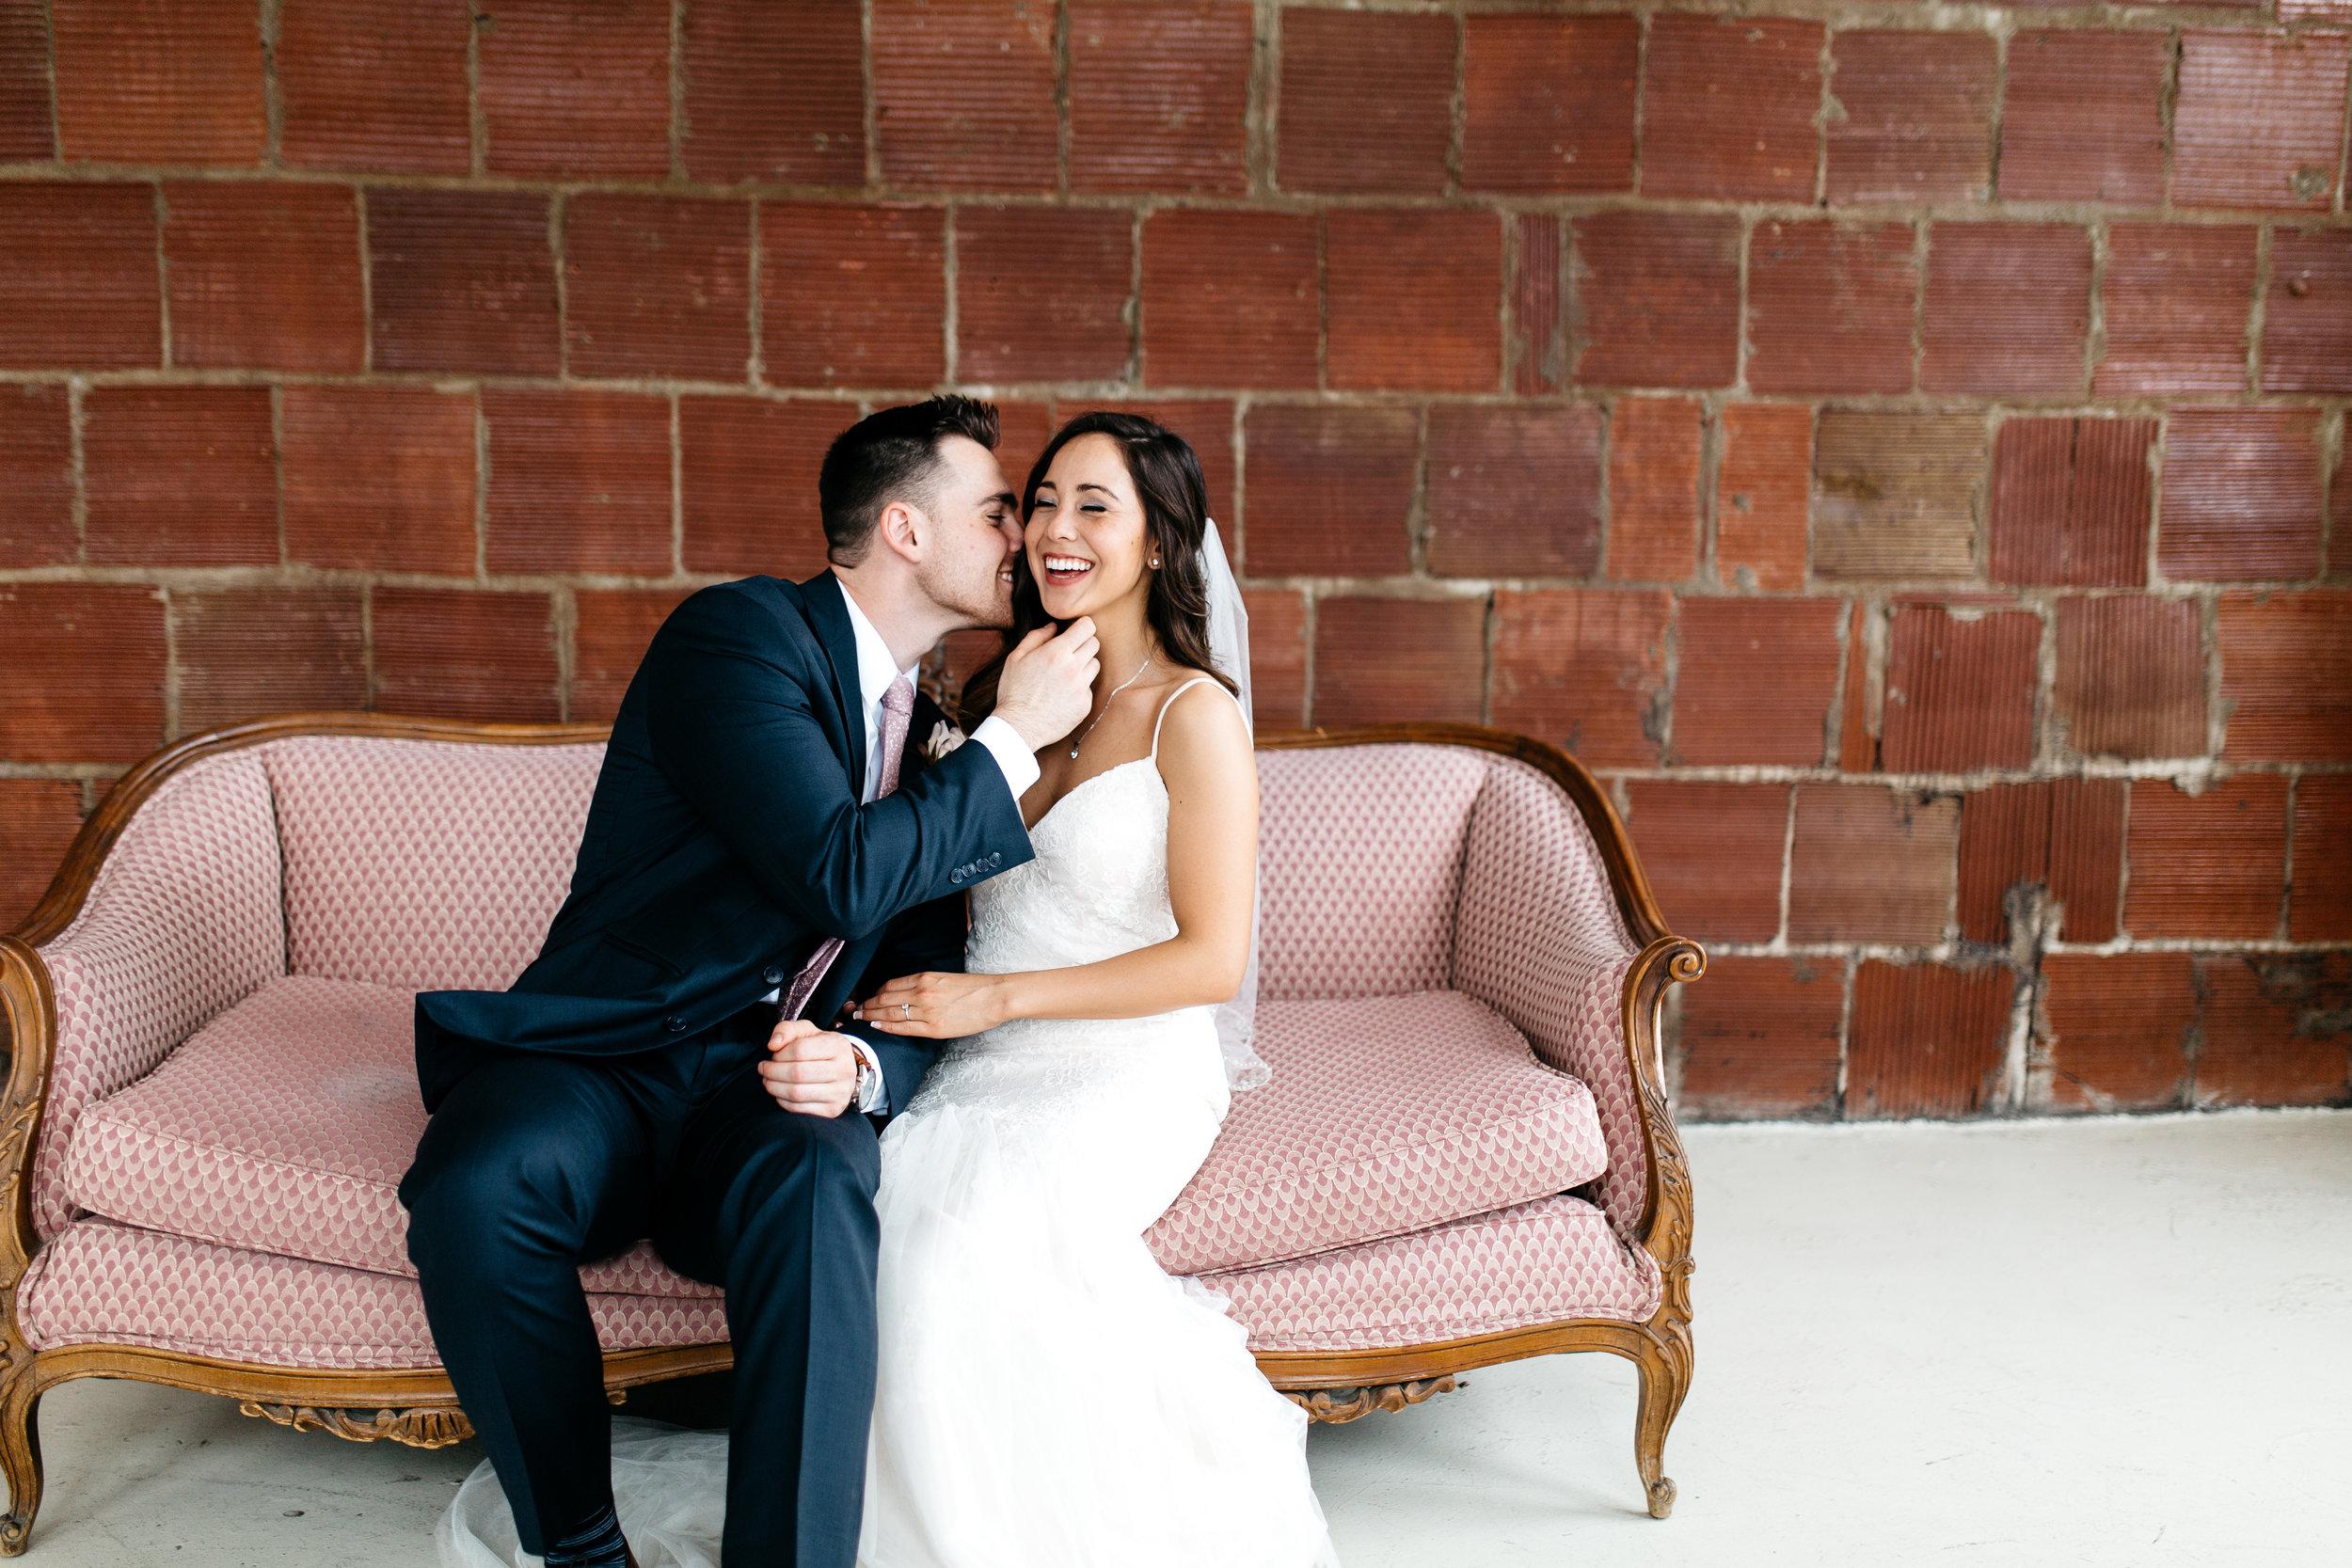 weddingblogmannring-103.jpg